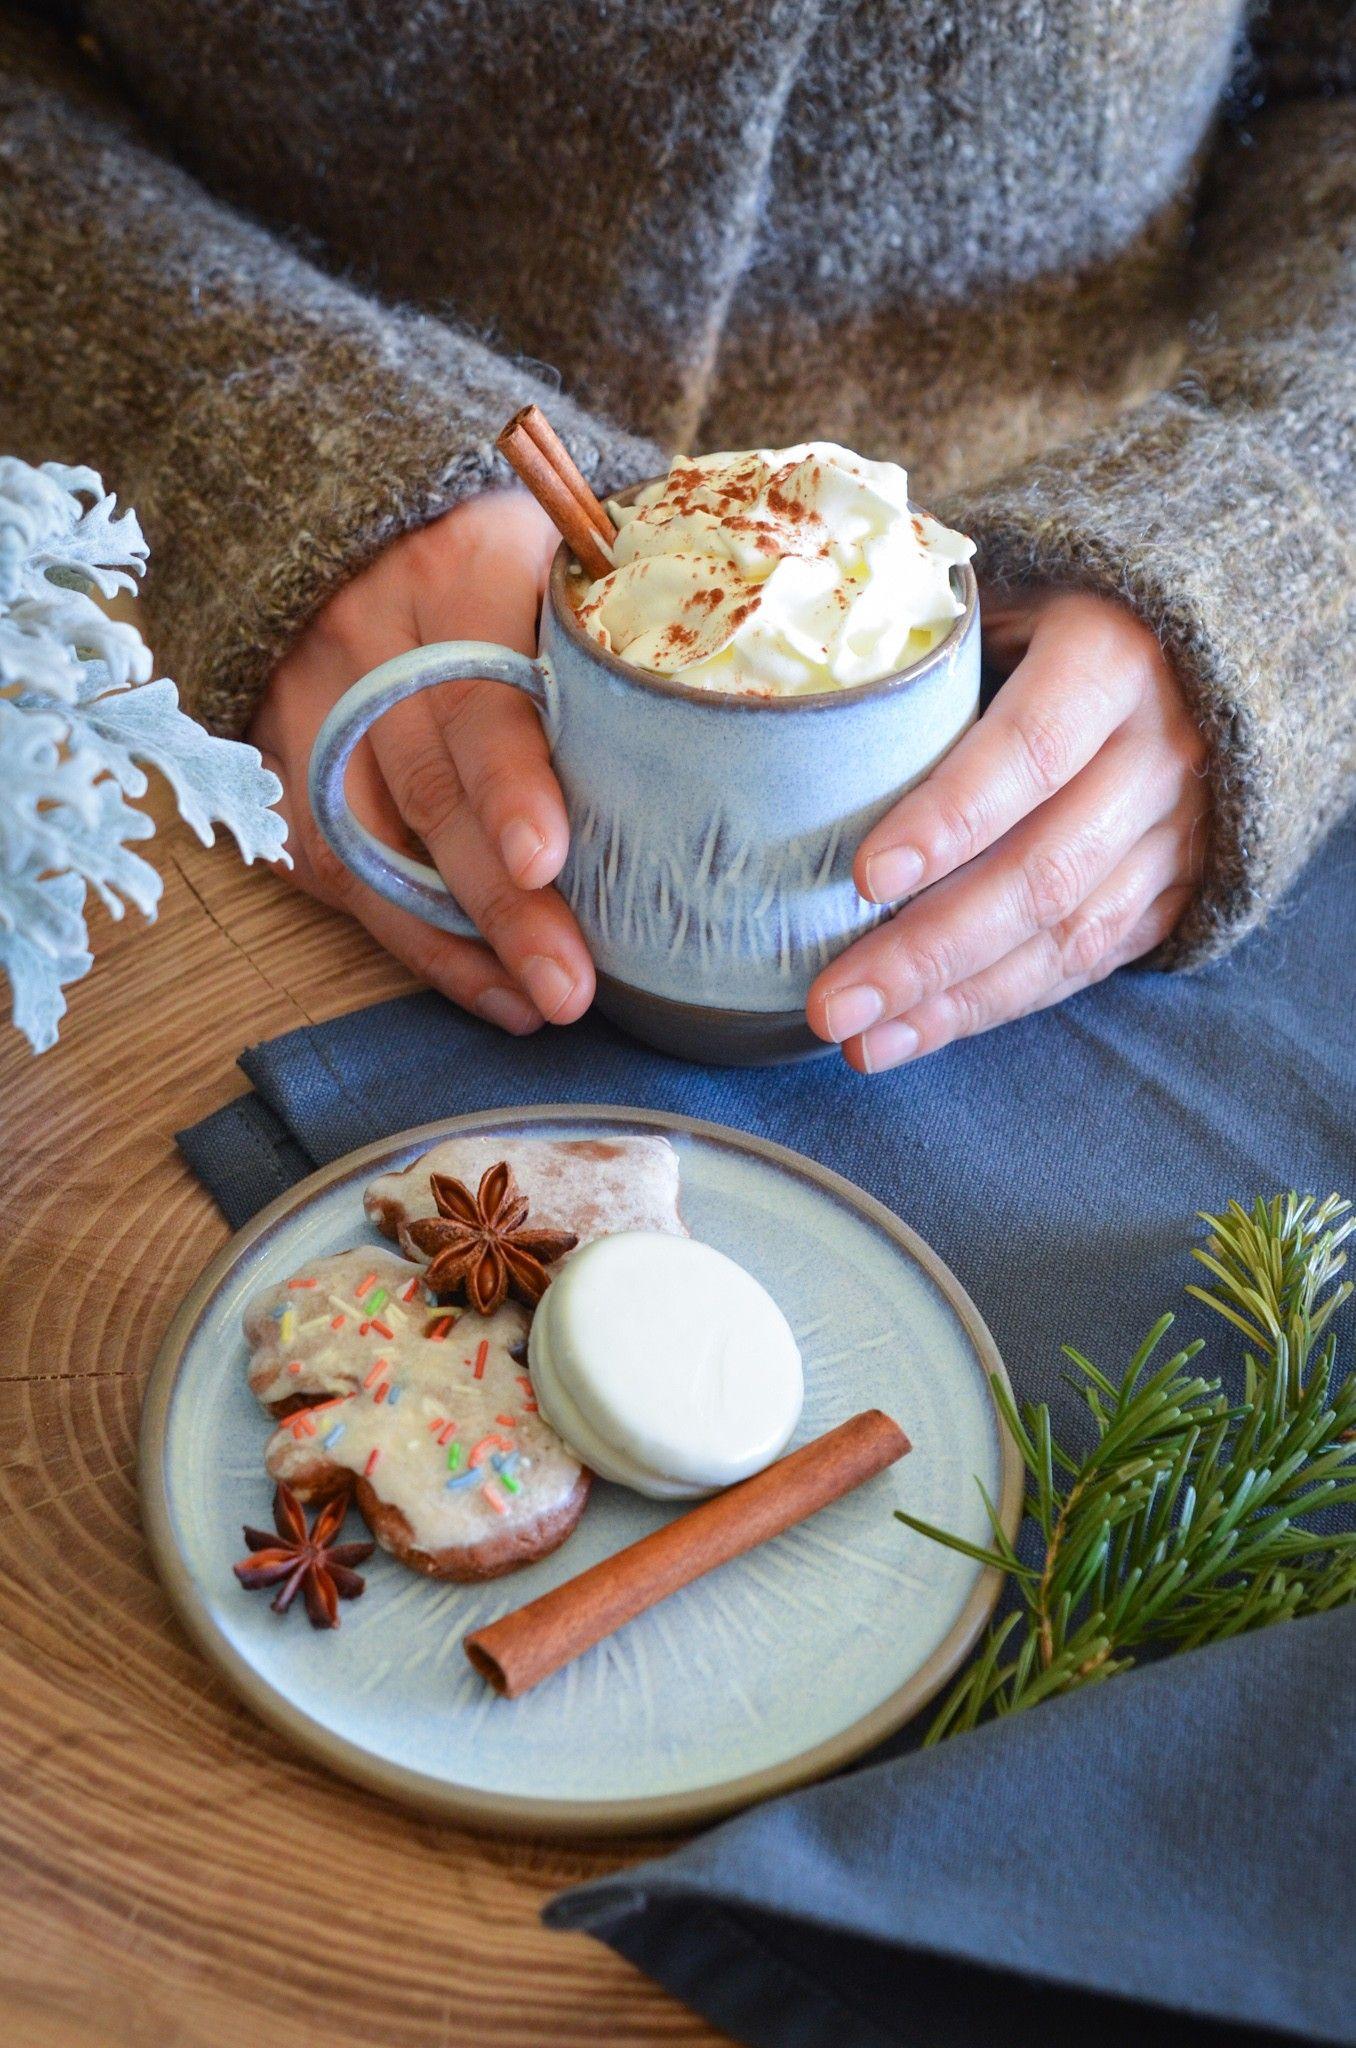 Handmade ceramics in wintermood by Gosha Ceramics. #pottery #poterie #clay #claylove #handmade #handmadeceramics #ceramics #ceramiclove #céramique #instapottery #ilovepottery #coffemug #gosha_ceramics #tableware #coffelover #homedecor #orginalgift #interiordesign #giftsidea #giftforher #coffe #cafe #tasse #Noël #christmasmood #tealover #wheelthrownpottery #blue #wheelthrownceramics #kitchenware #funcionalpottery #slowliving #amateurdethé #amateurdecafé